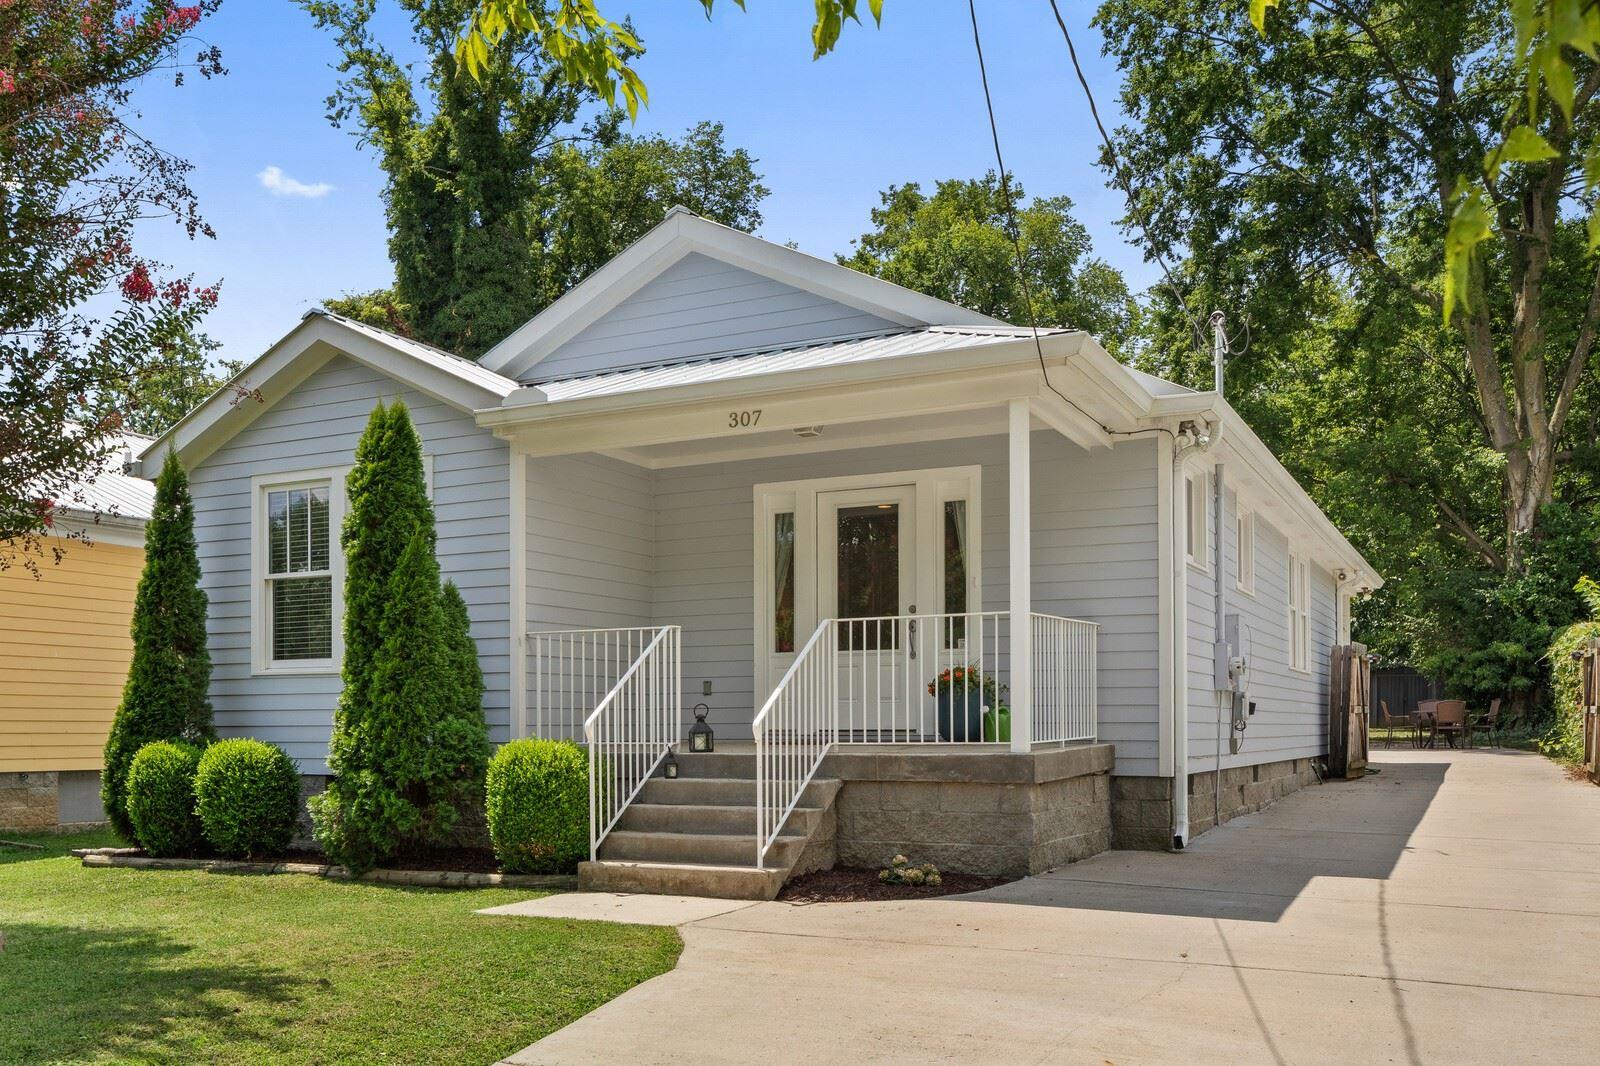 Photo of 307 Morton Ave, Nashville, TN 37211 (MLS # 2166865)